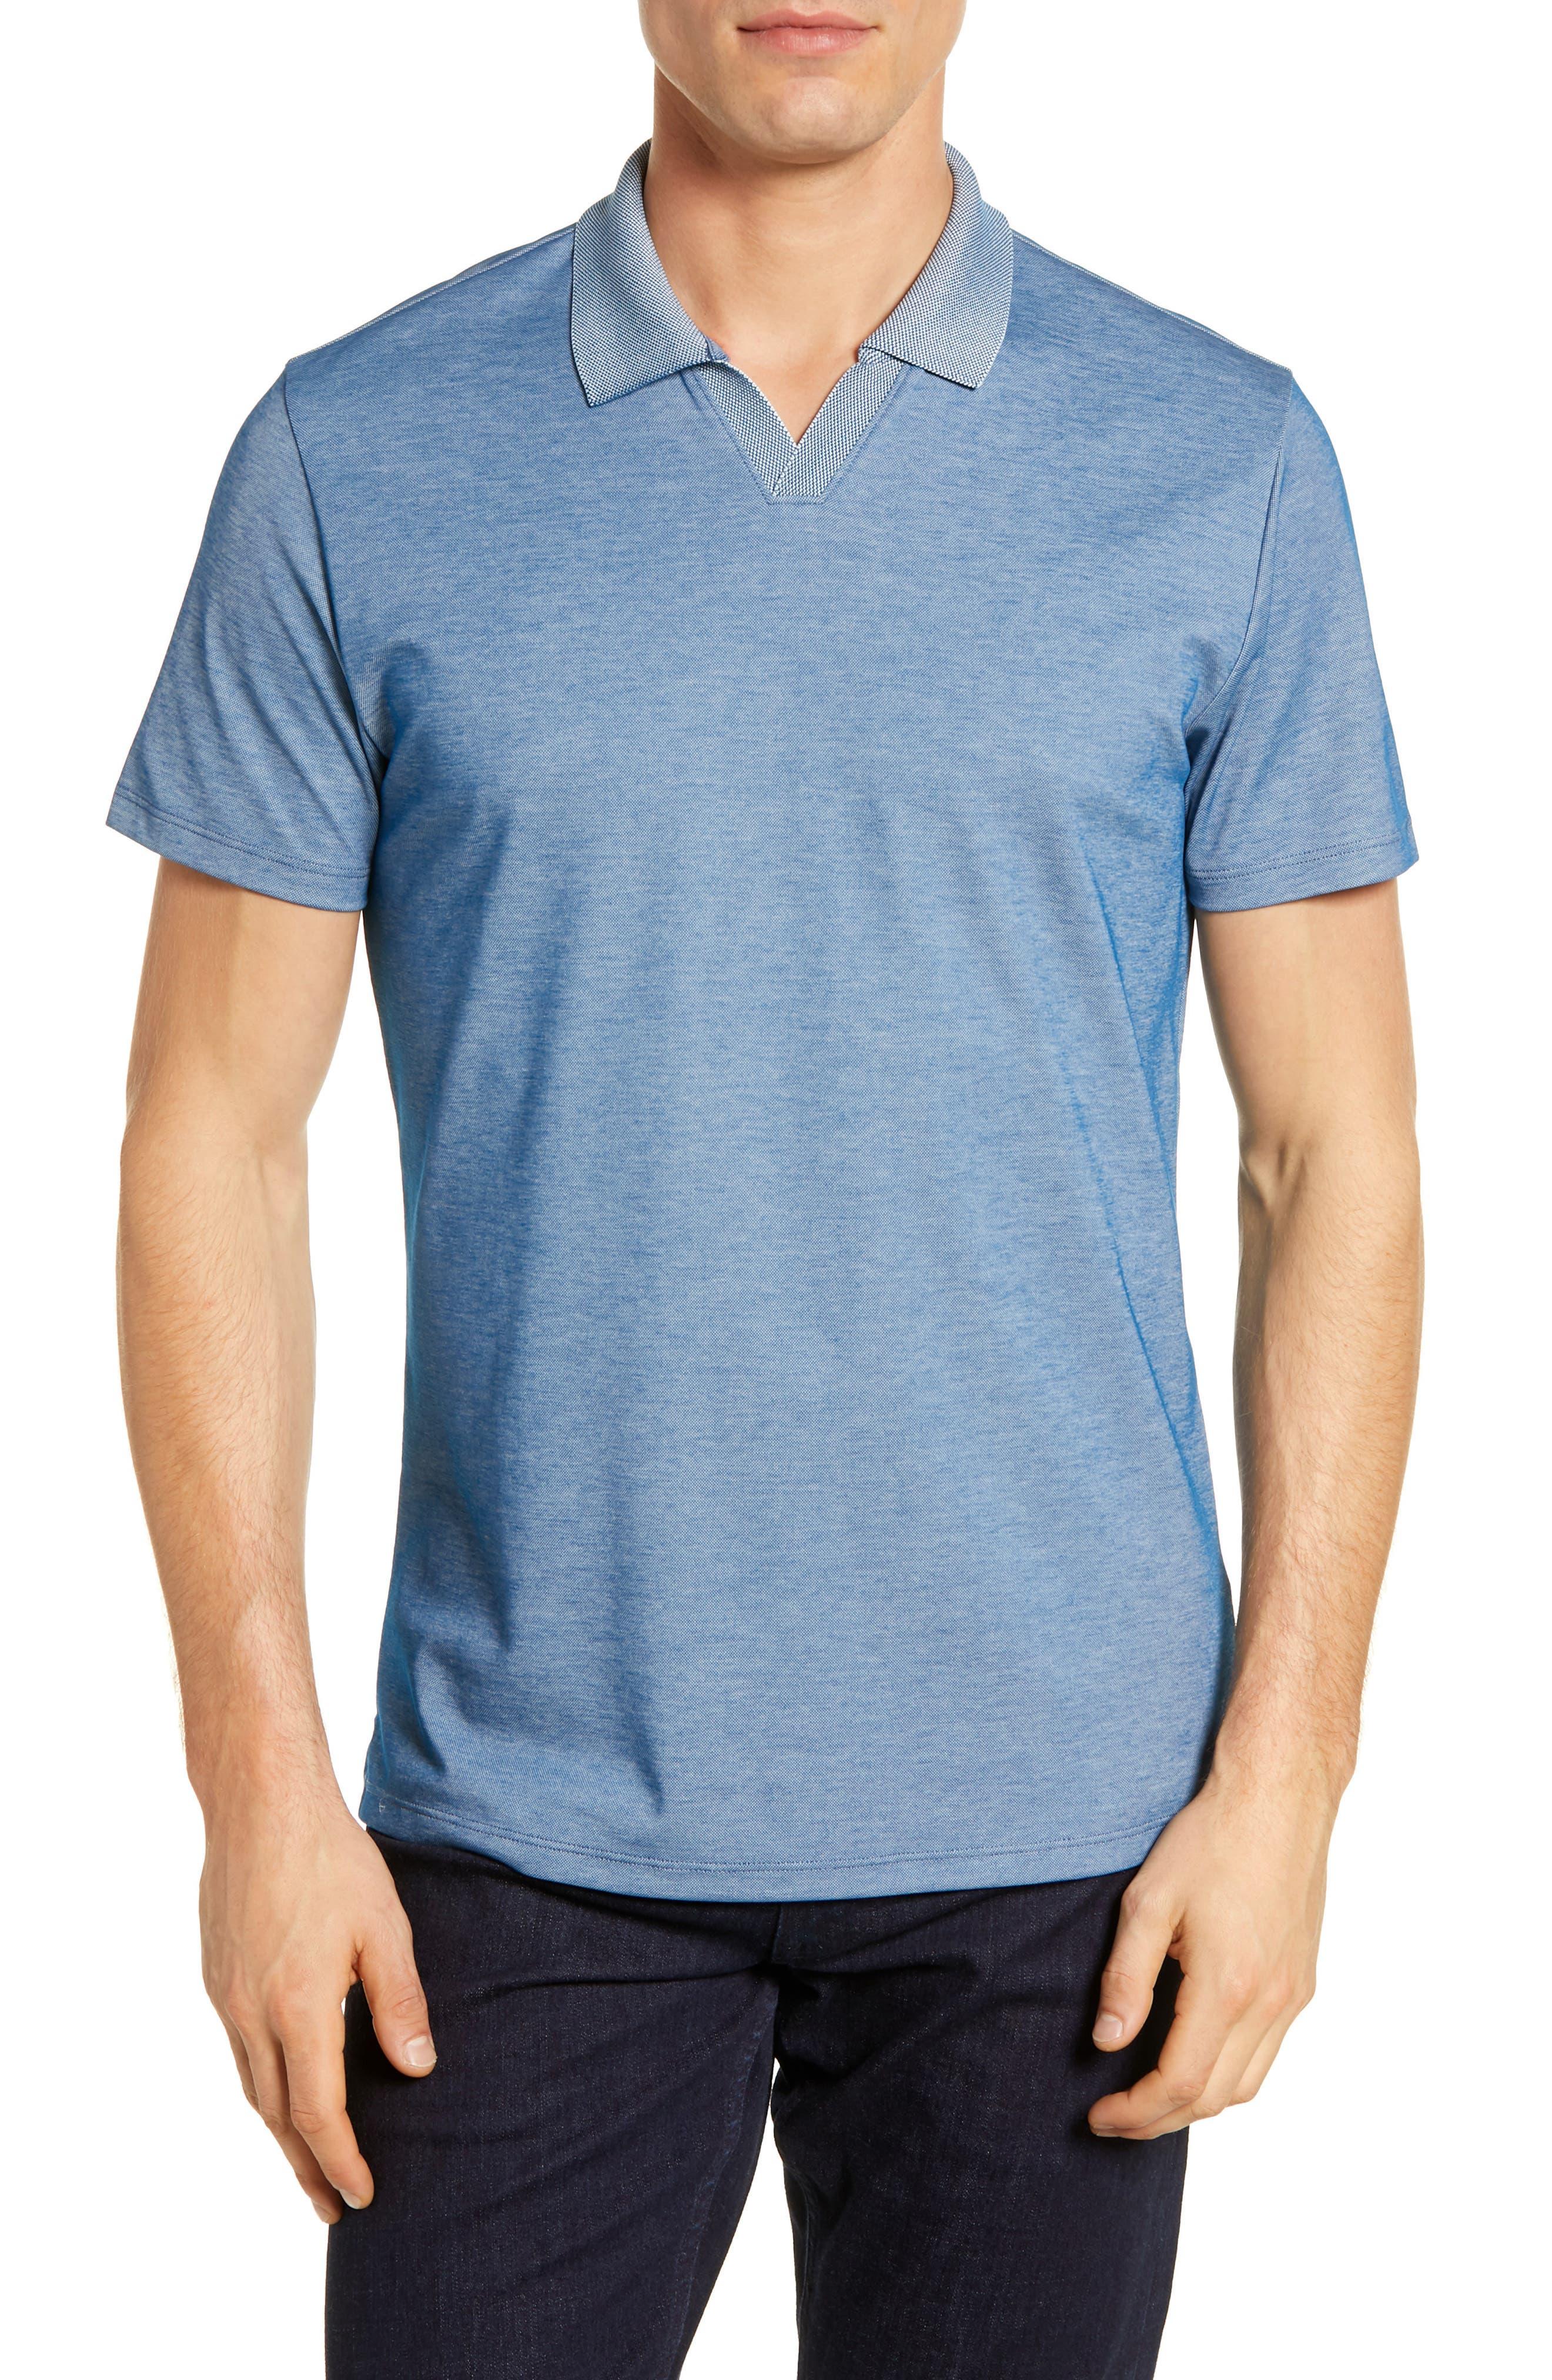 7df997e322 Vintage Shirts – Mens – Retro Shirts Mens Robert Barakett Casey Johnny  Collar Polo Size Large